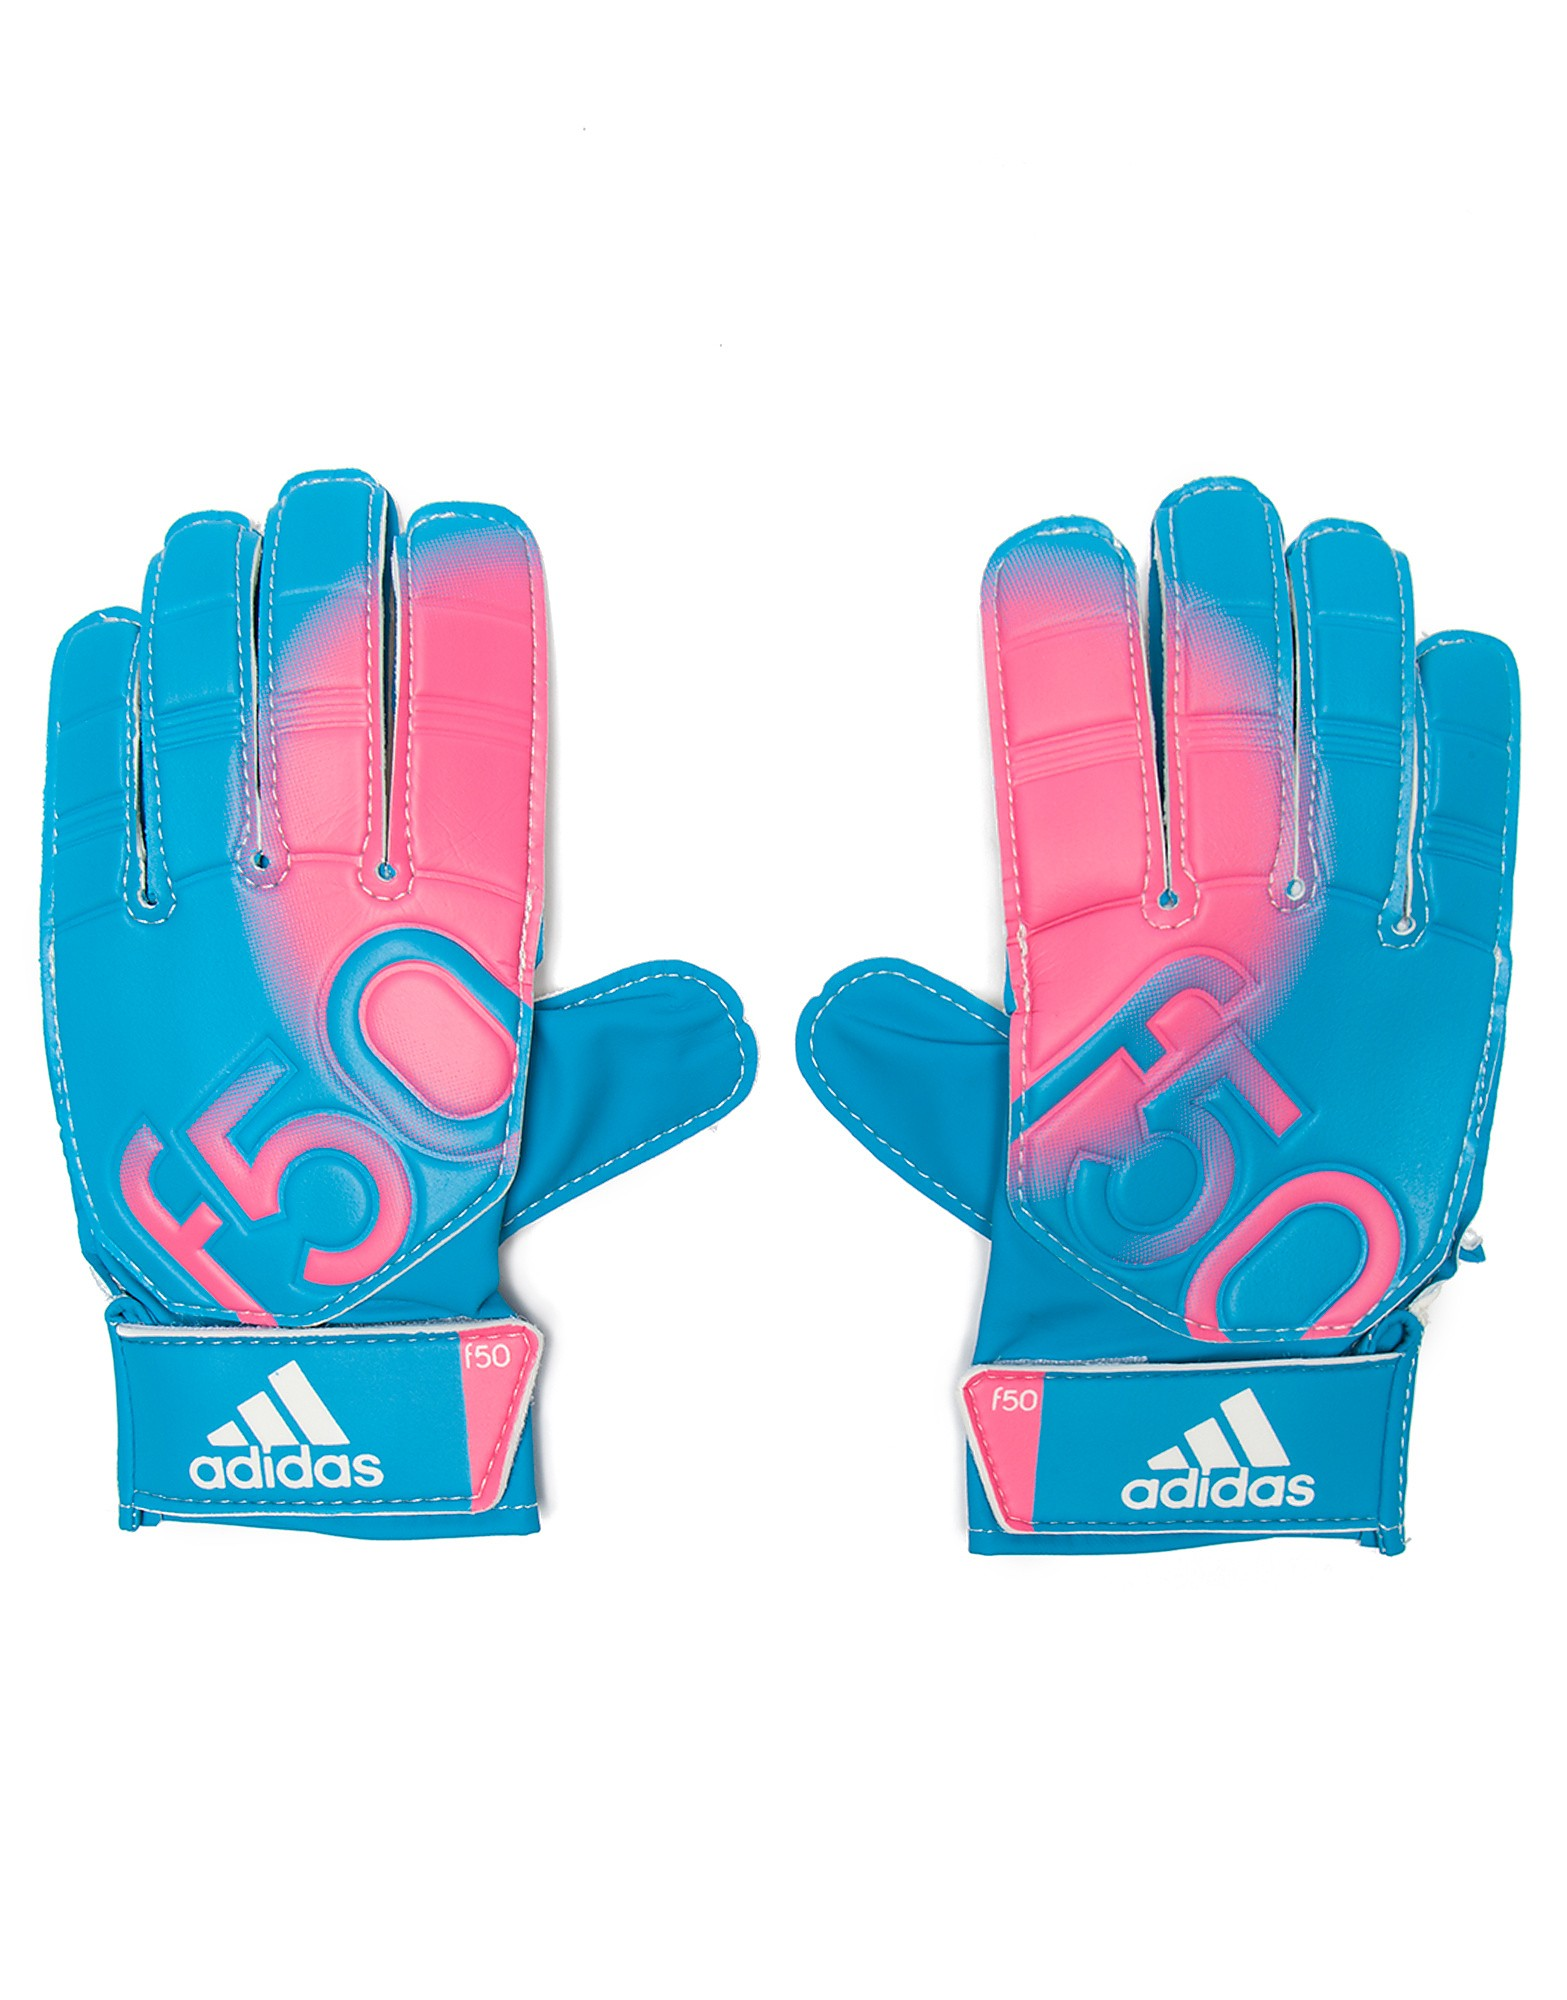 adidas F50 Goaklkeeper Training Gloves